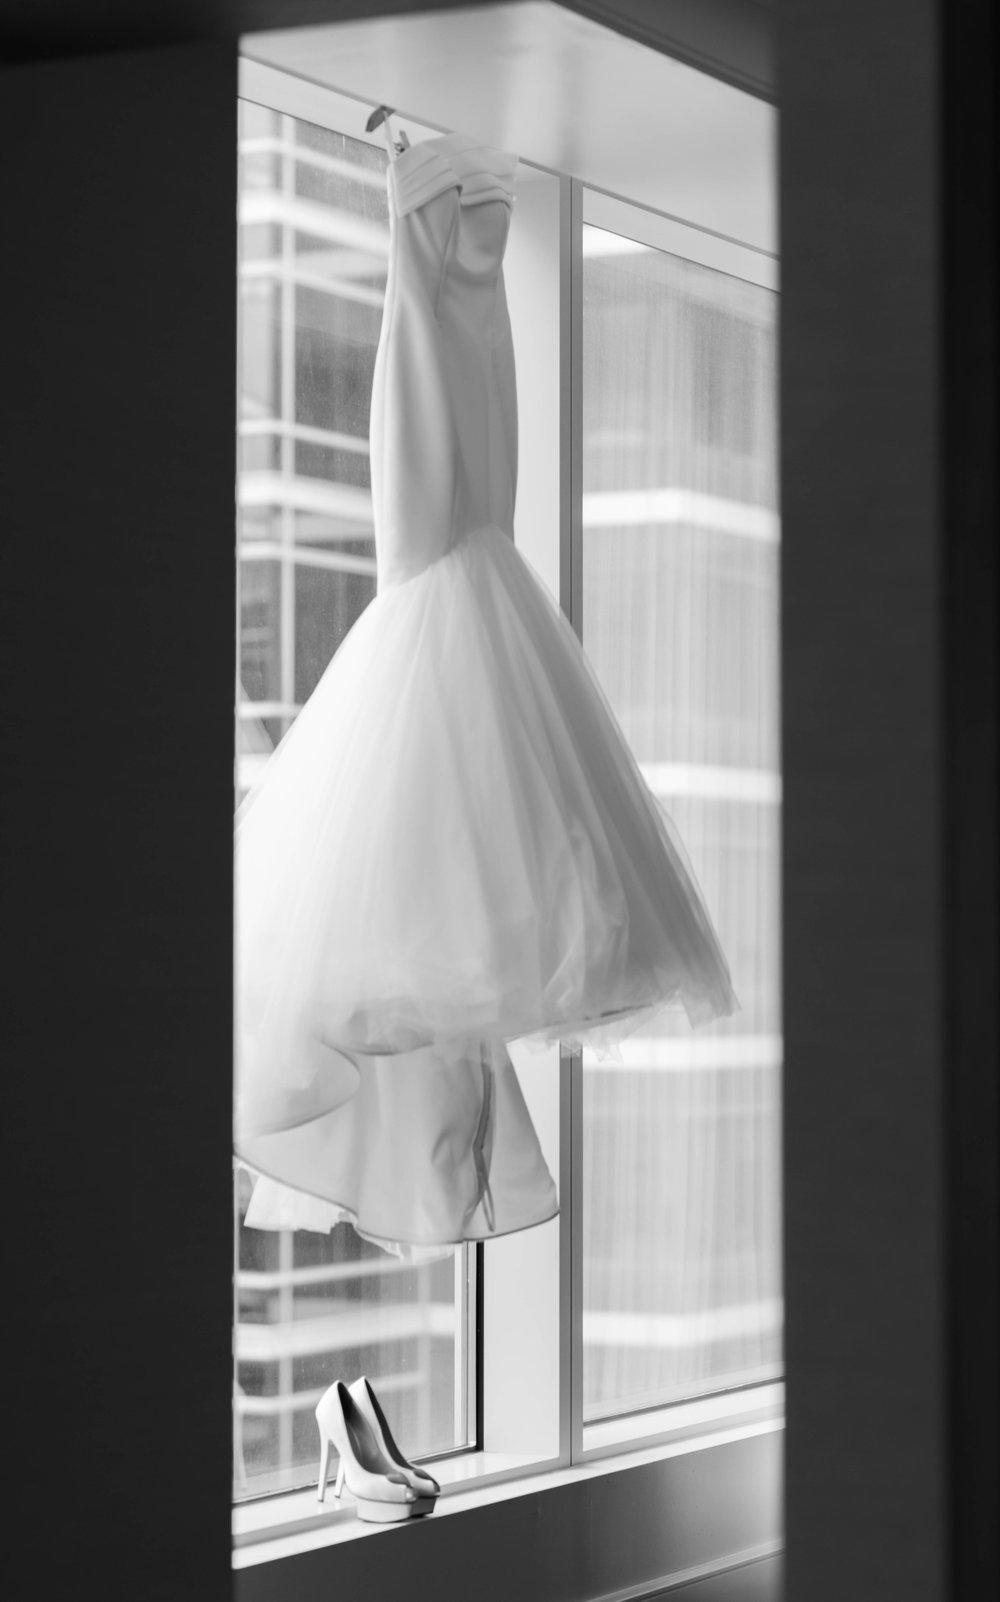 kleinfeld wedding dress